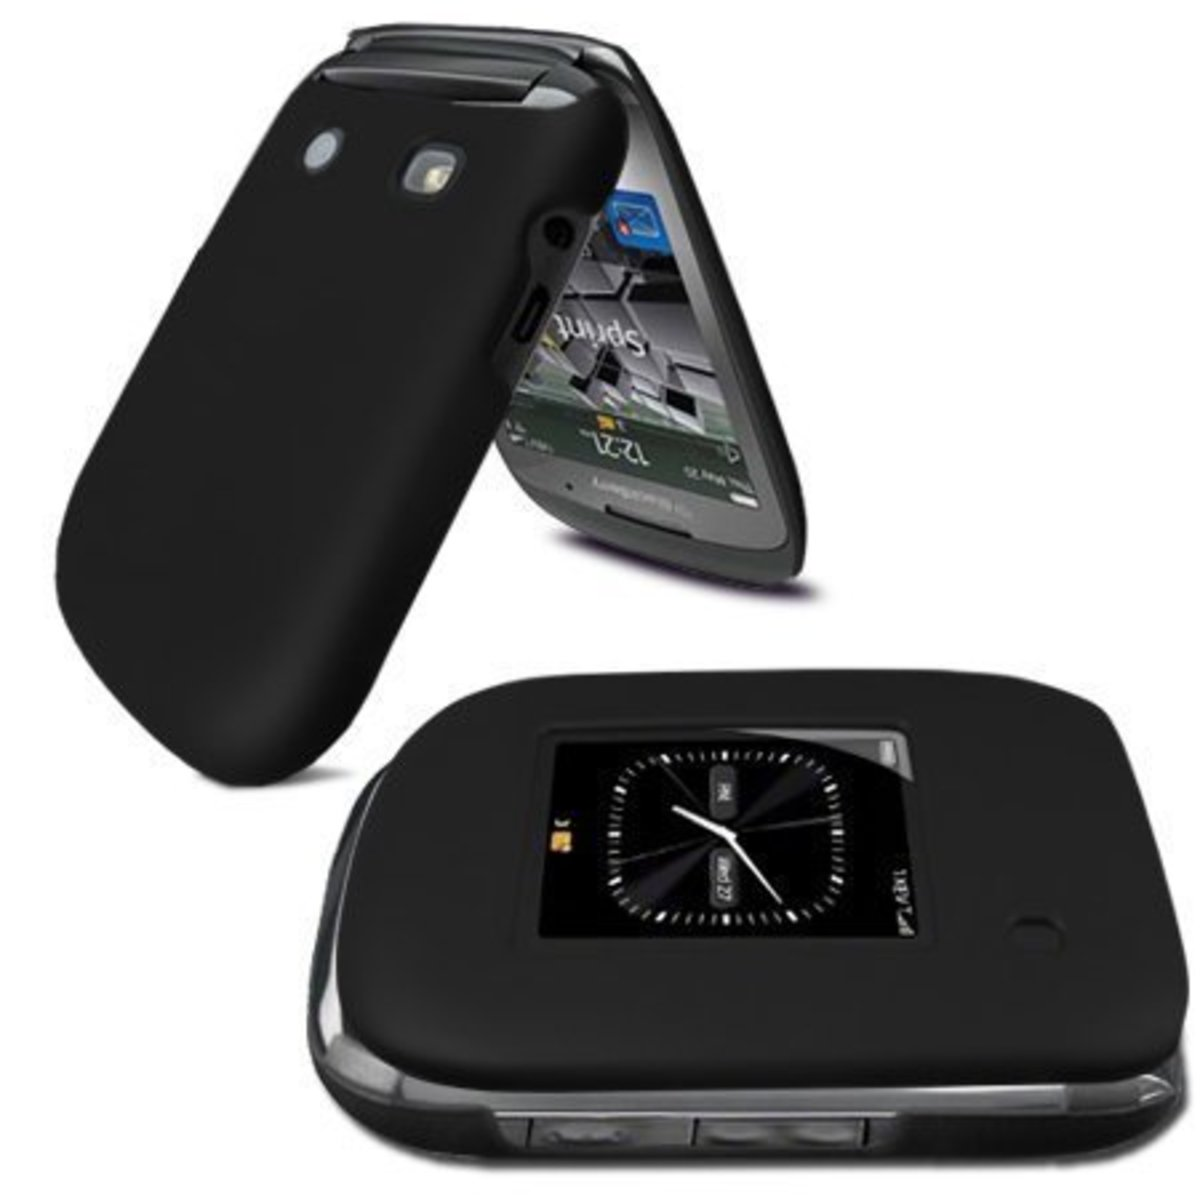 the best 8 flip phones on the market | turbofuture